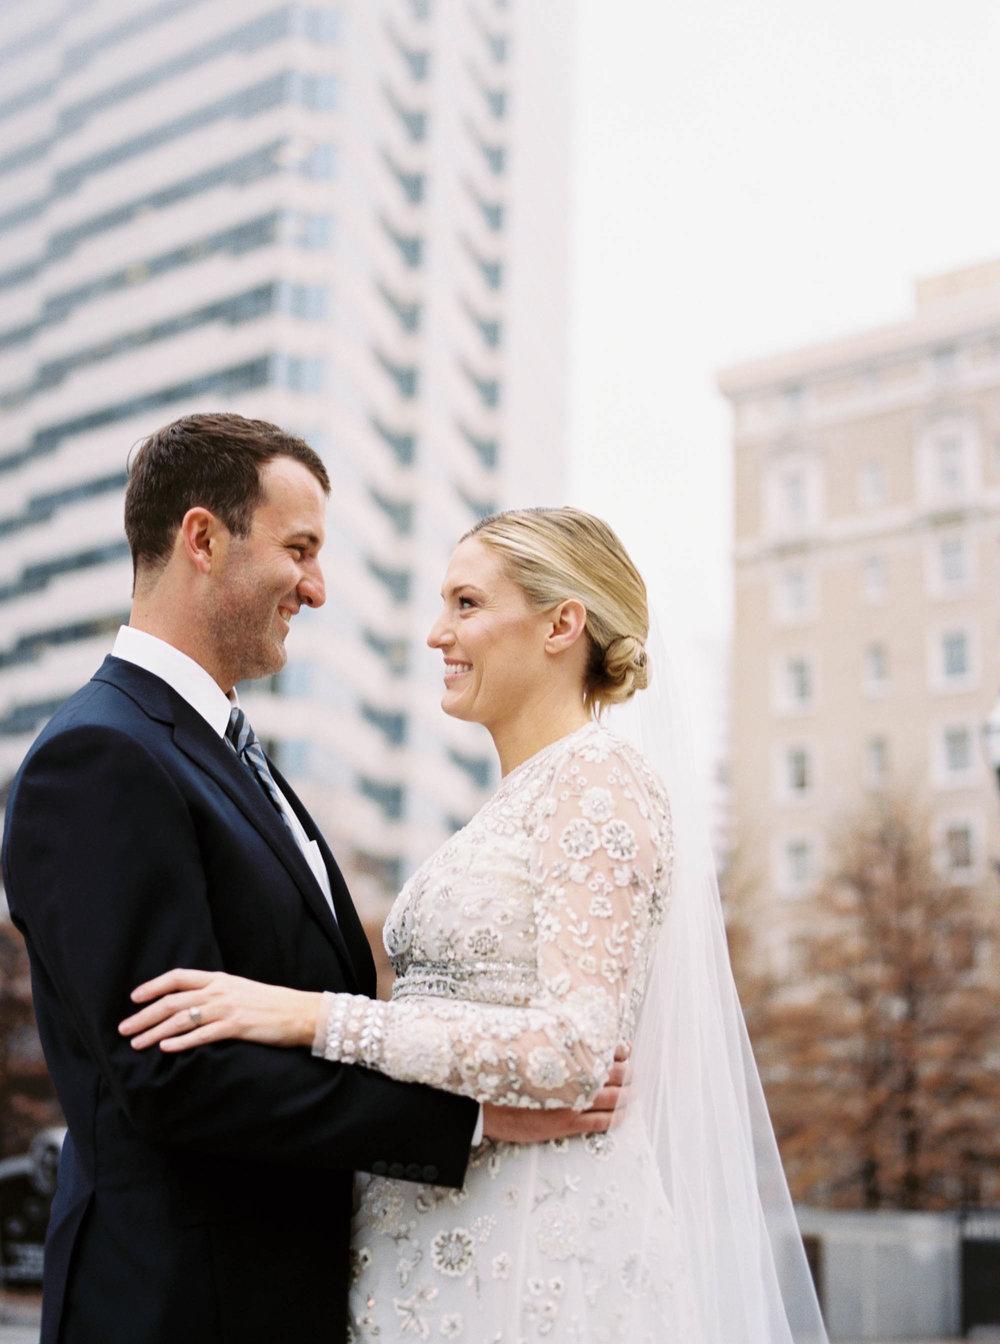 chris + jessica hermitage hotel wedding photographers nashville ©2017abigailbobophotography-12.jpg